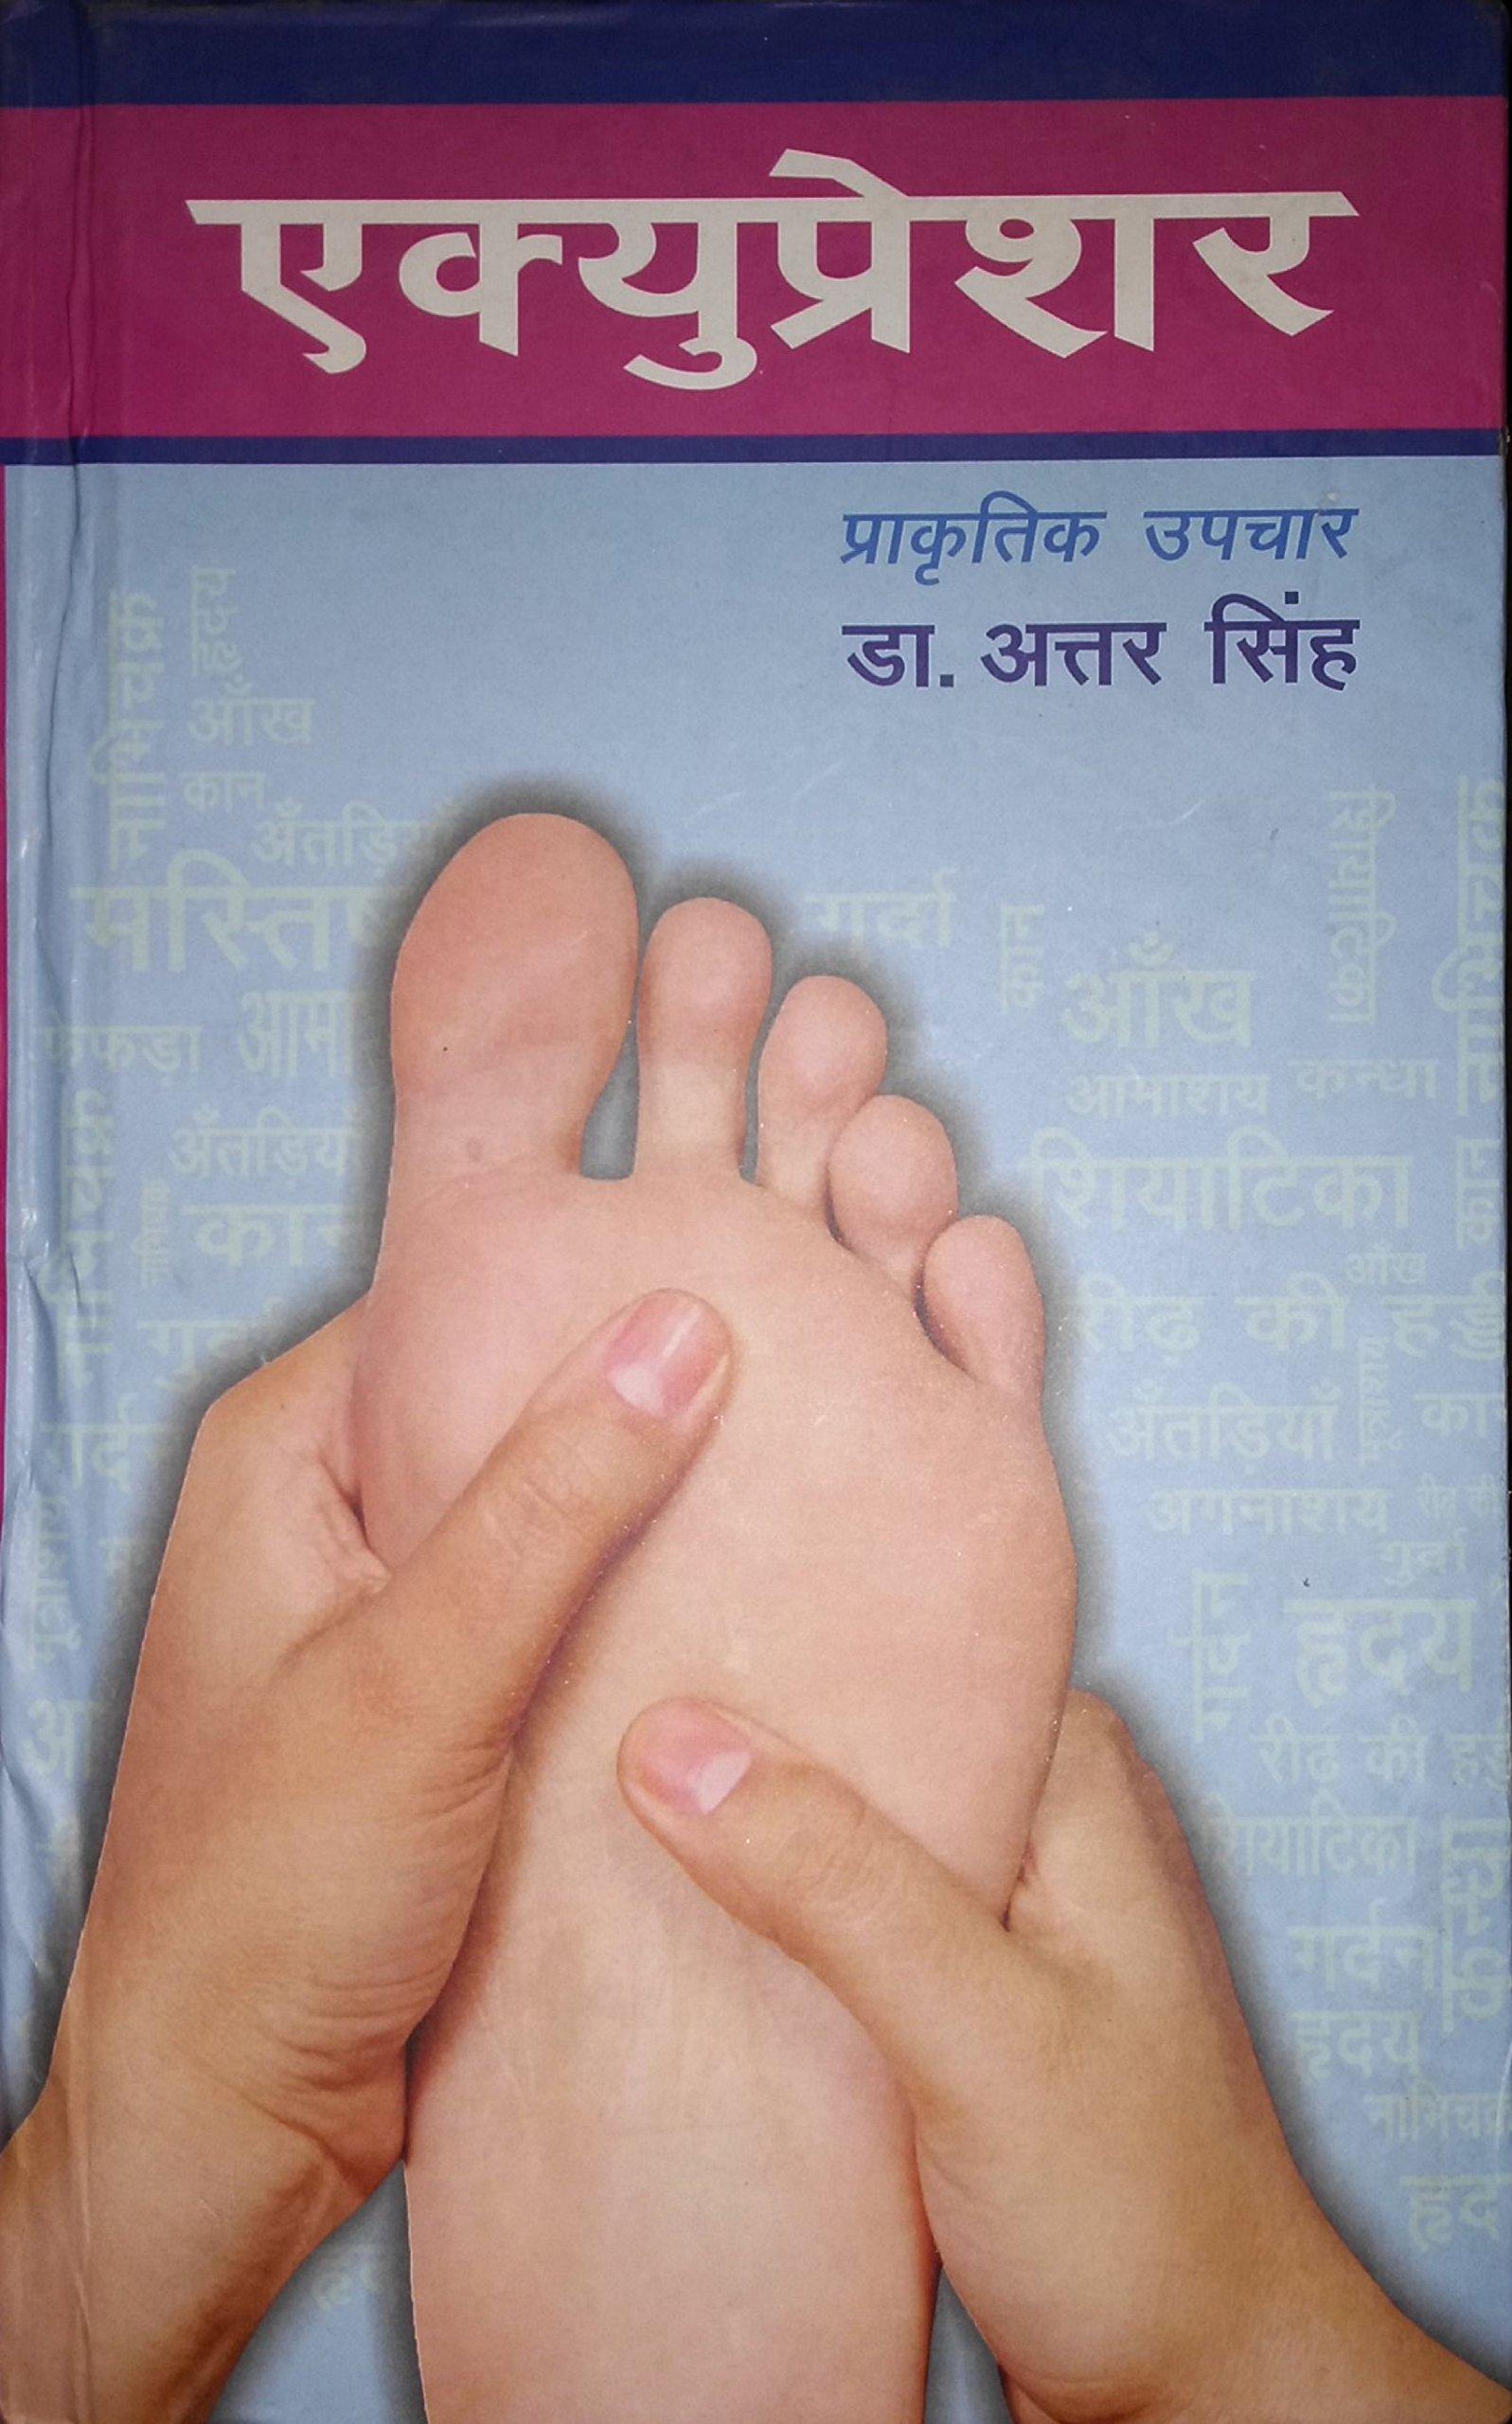 Acupressure Books In Tamil Pdf